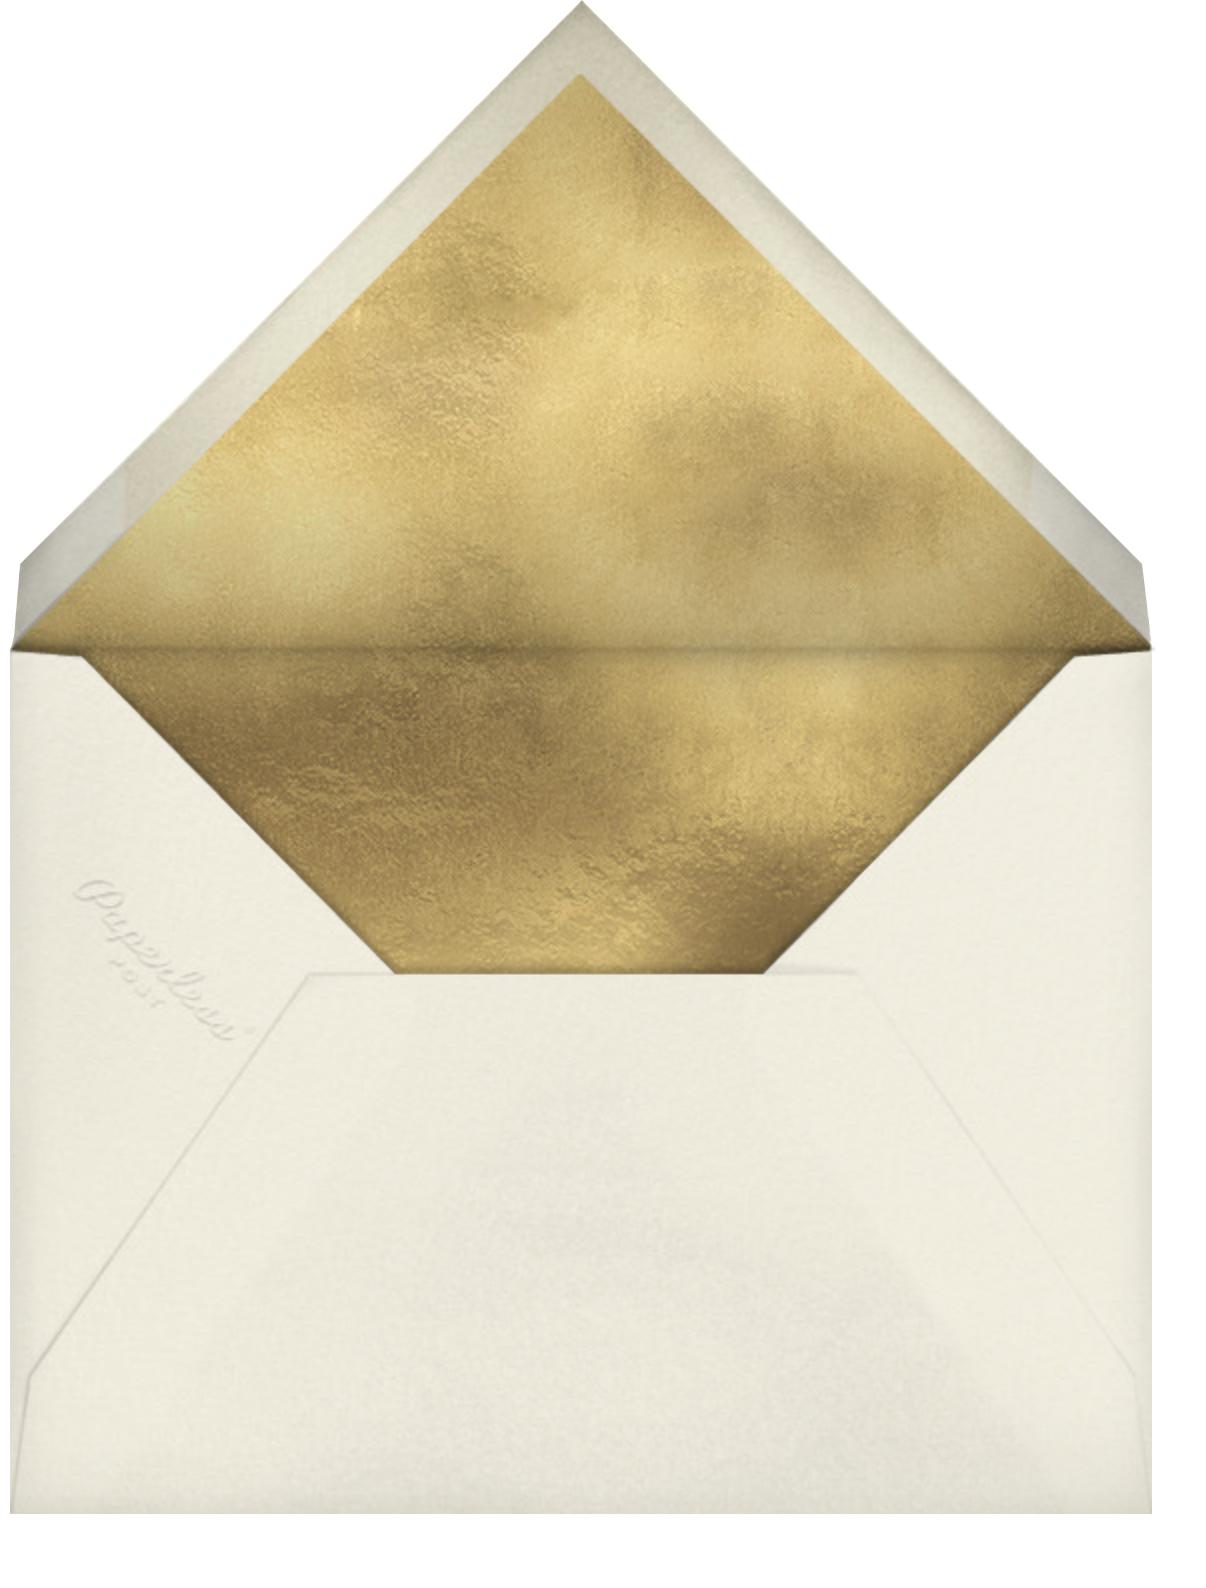 Cute Flutes - kate spade new york - Envelope